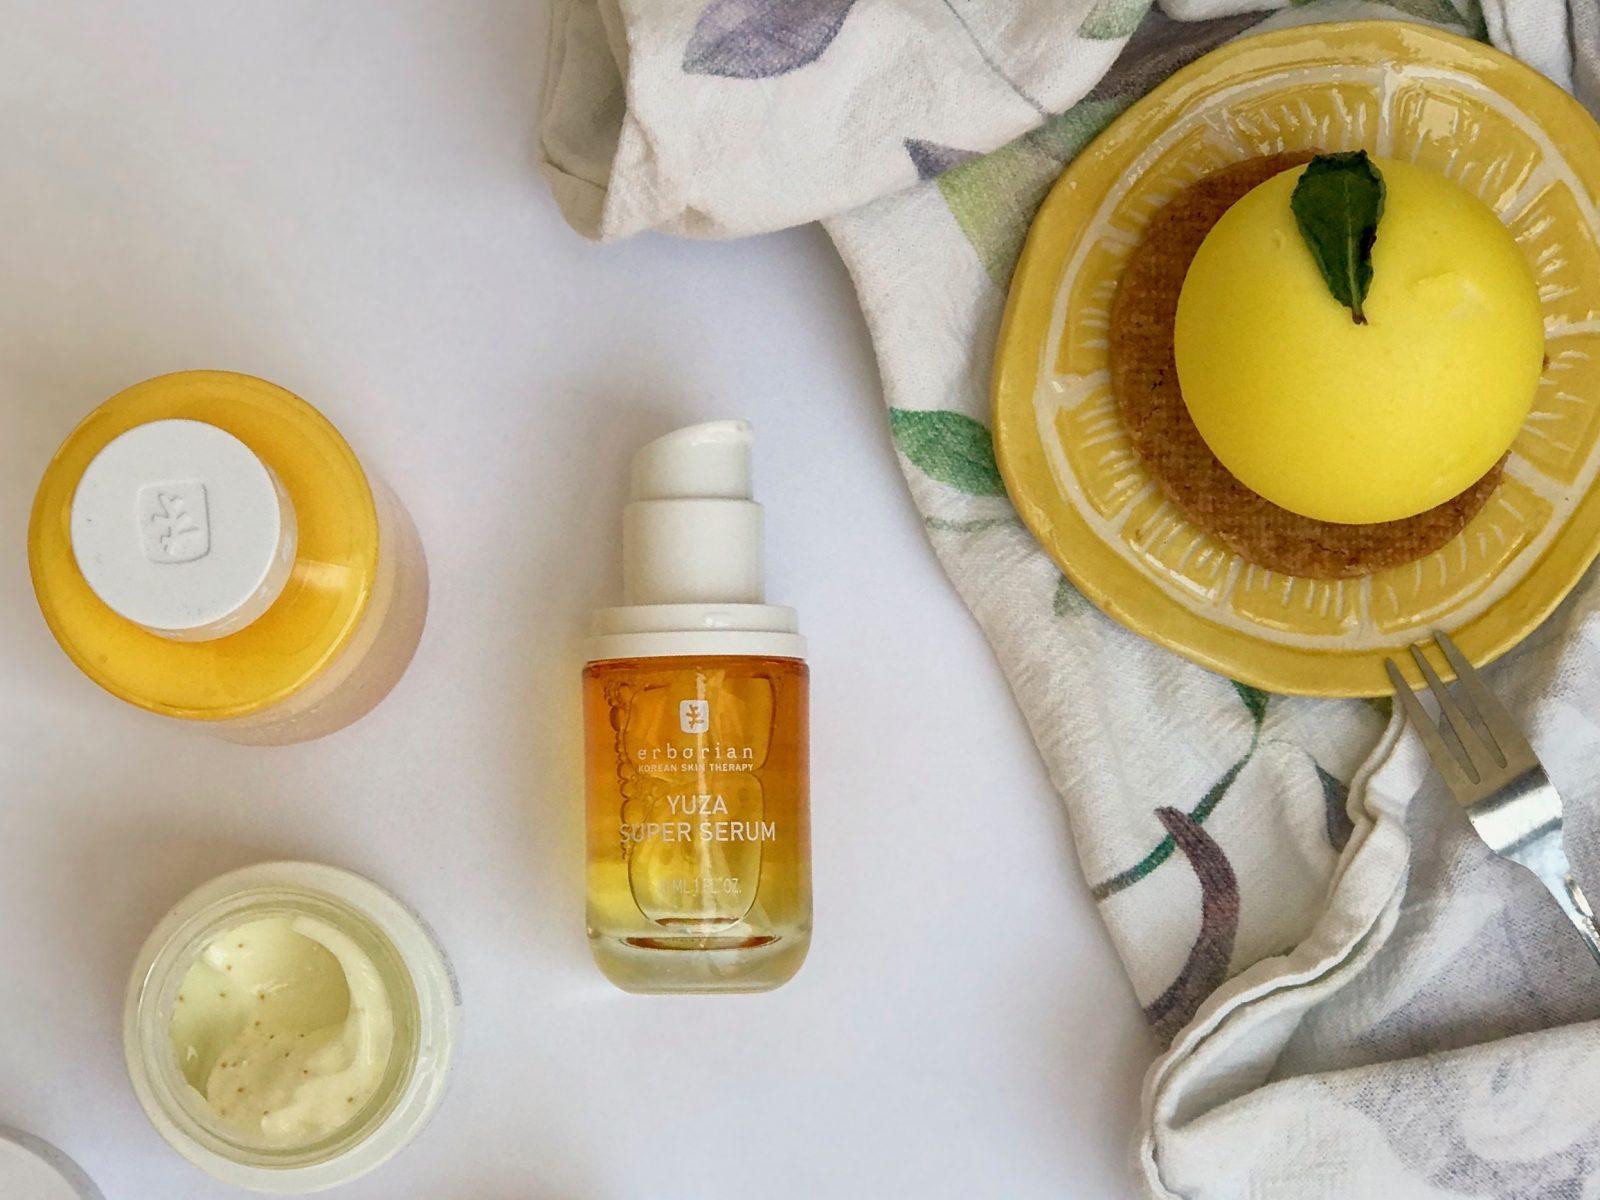 loreal juzo yuzo naravna aktivna ucinkovina kozmetika nika veger beautyfull blog erborian